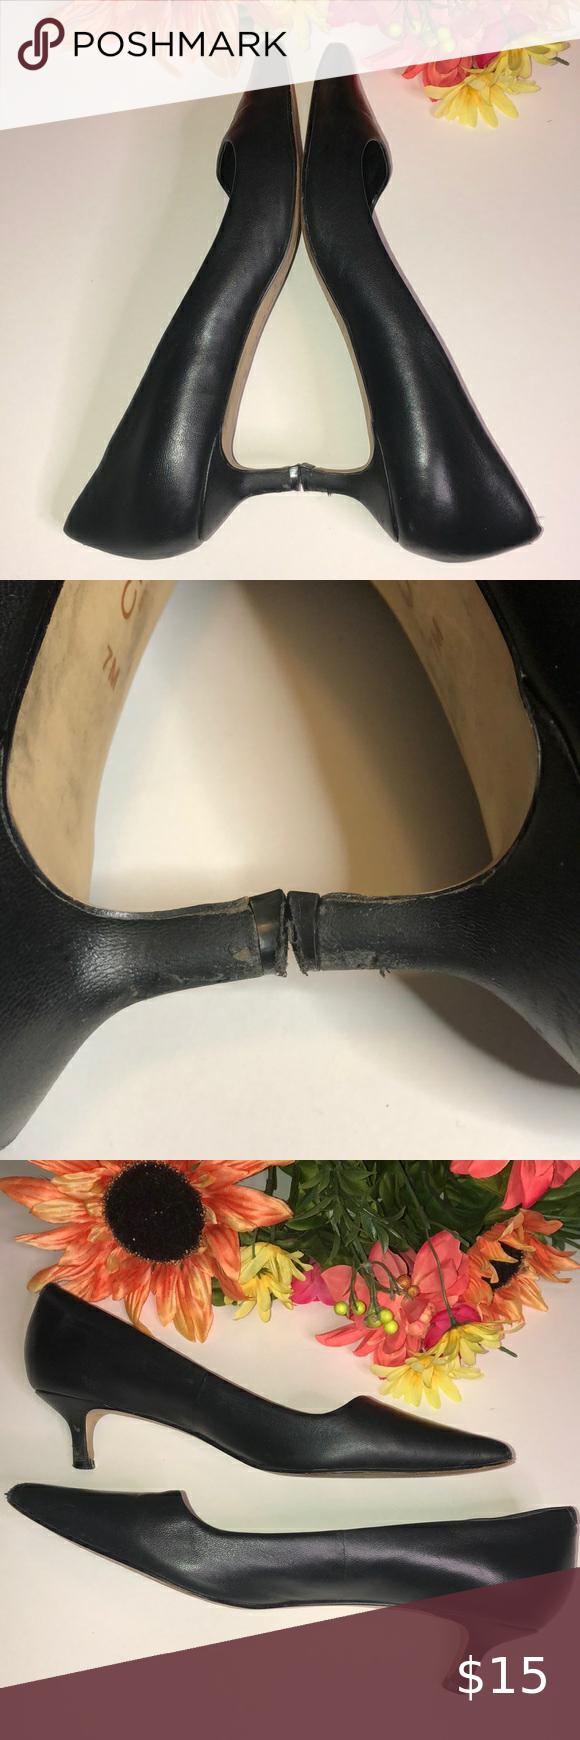 Charles David Leather Kitten Heel Pointed Toe In 2020 Kitten Heels Shoes Women Heels Heels